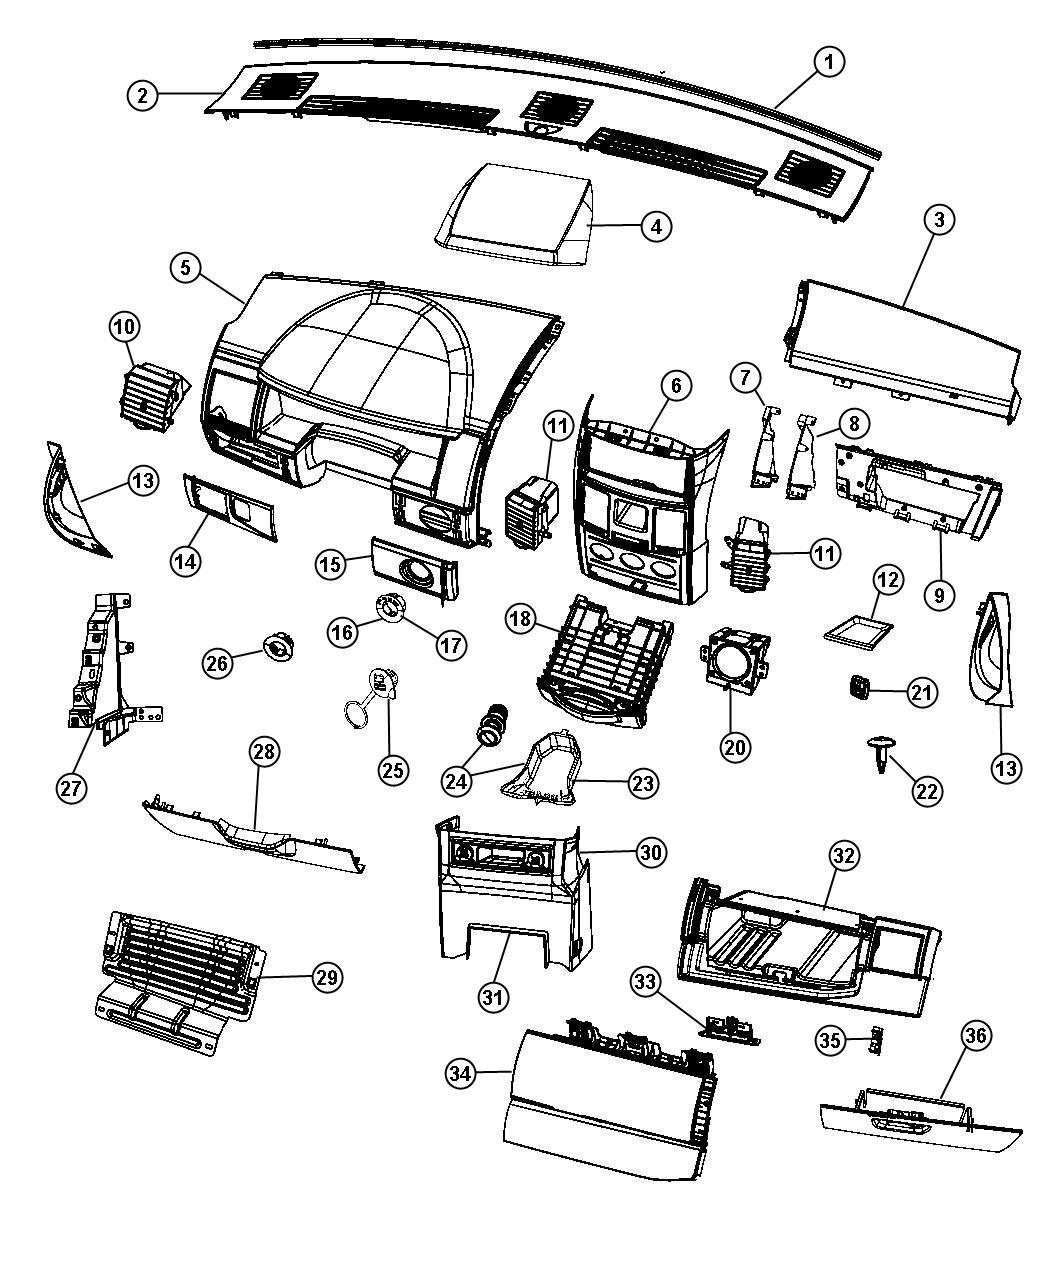 2010 Dodge Grand Caravan Bin  Glove Box  Instrument Panel